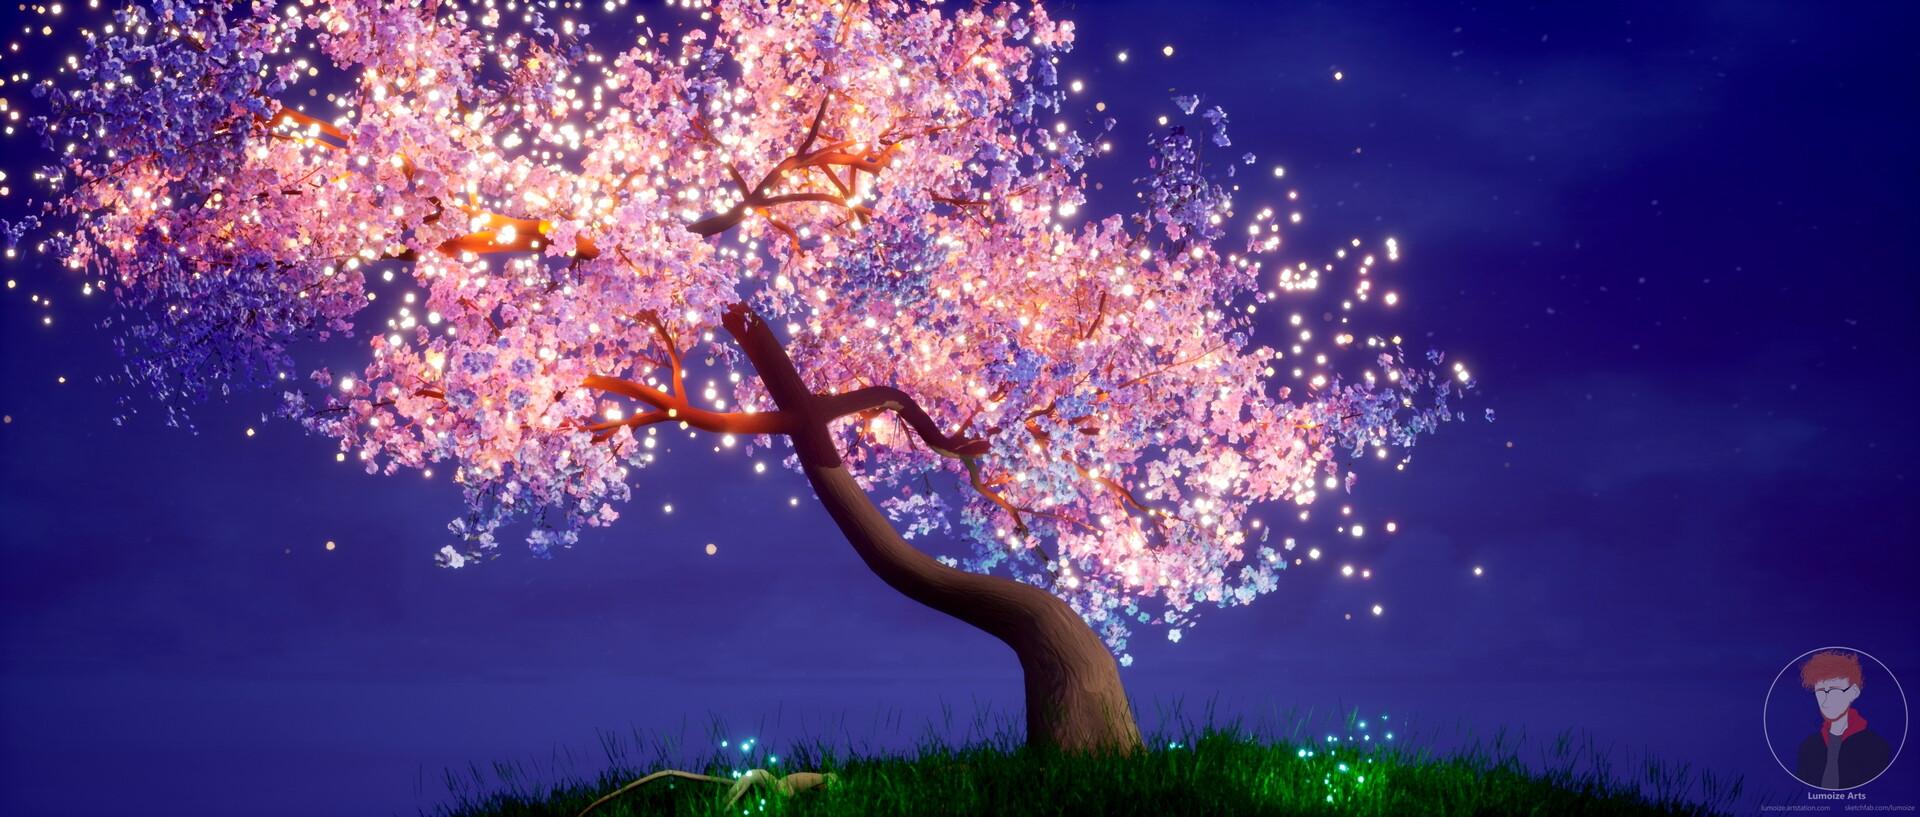 Artstation Mystical Cherry Tree Animated Wallpaper Brendon Kibler